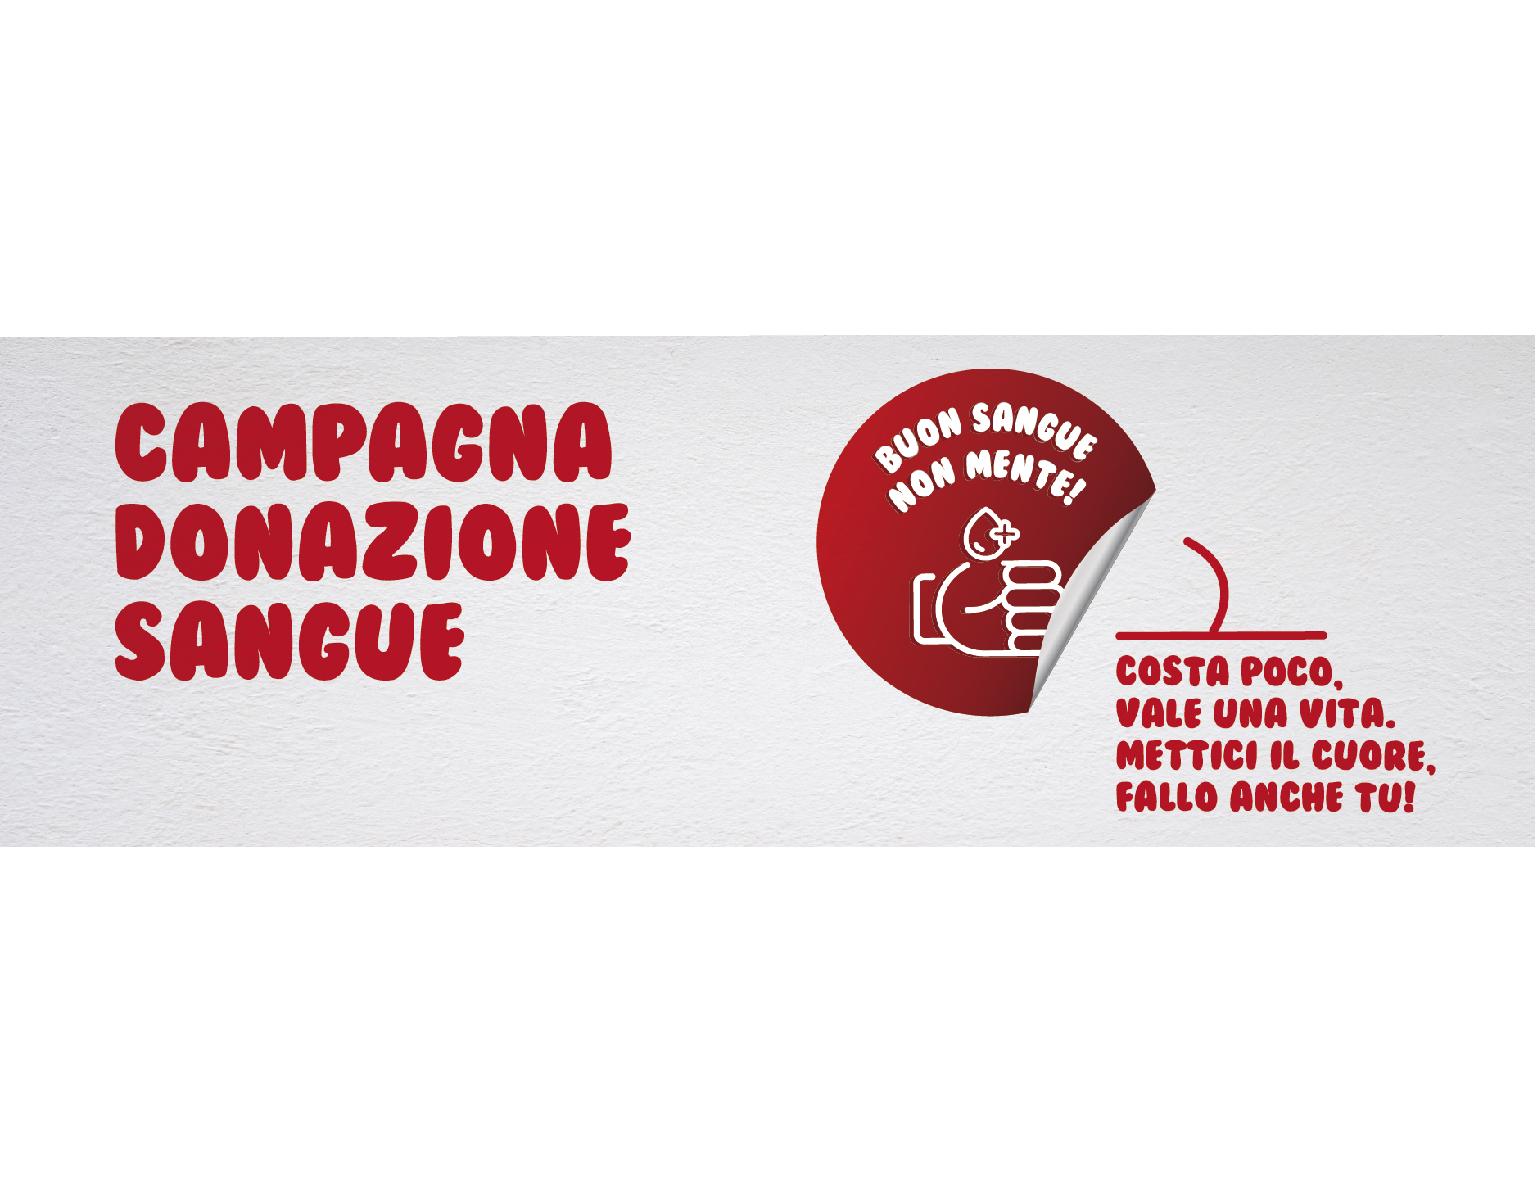 banner_landingpage_DONAZIONE_SANGUE_2020_new-01 (1)